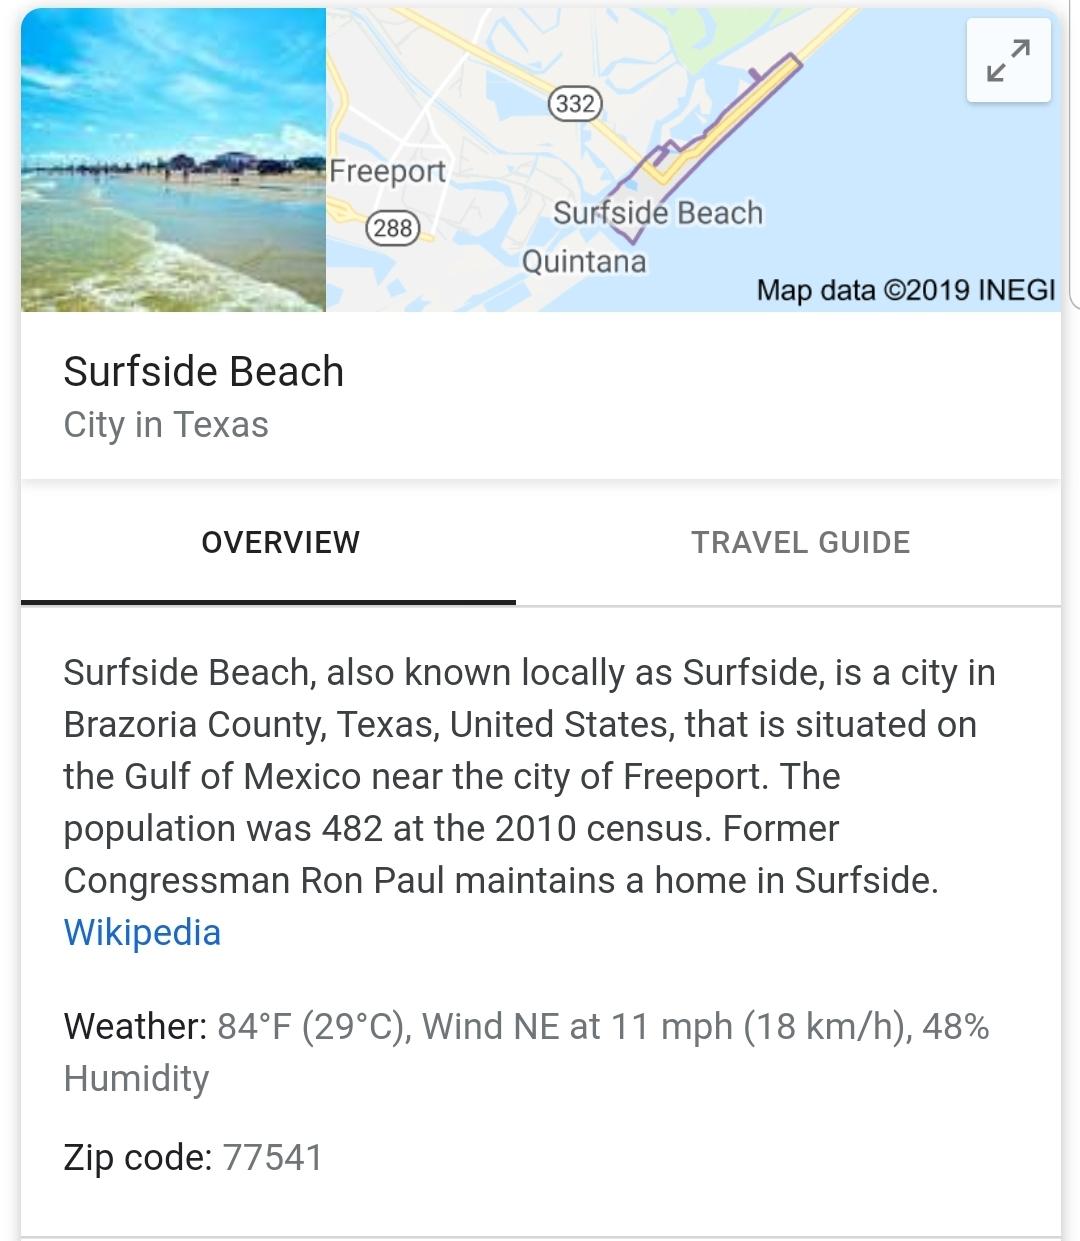 surfsidebeach.jpg